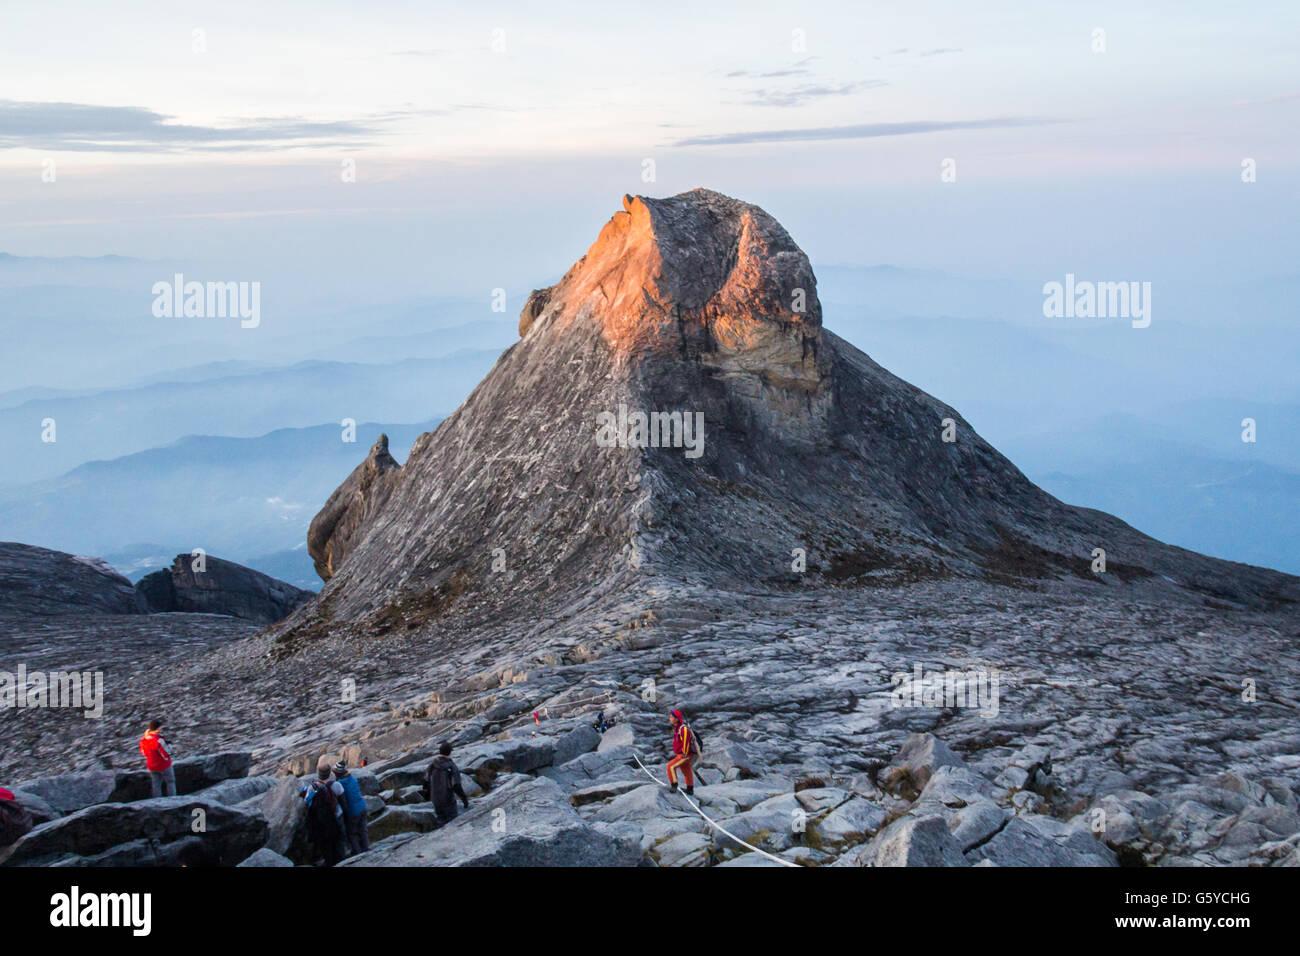 The summit of Mount Kinabalu in Sabah Malaysia - Stock Image